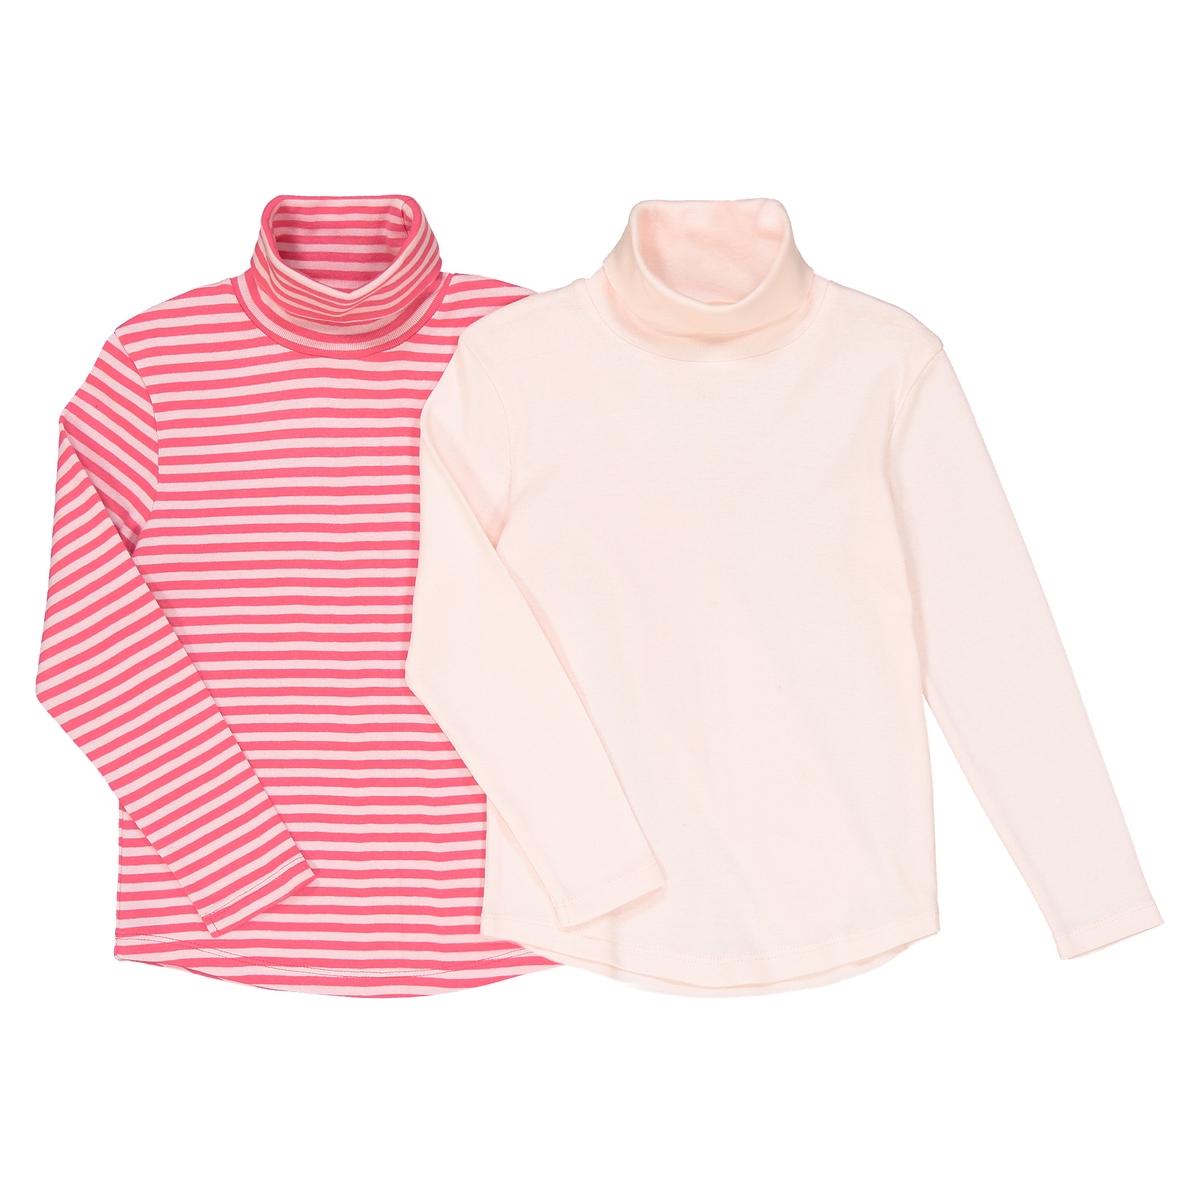 2 тонких пуловера в полоску с рисунком, 3-12 лет La Redoute Collections